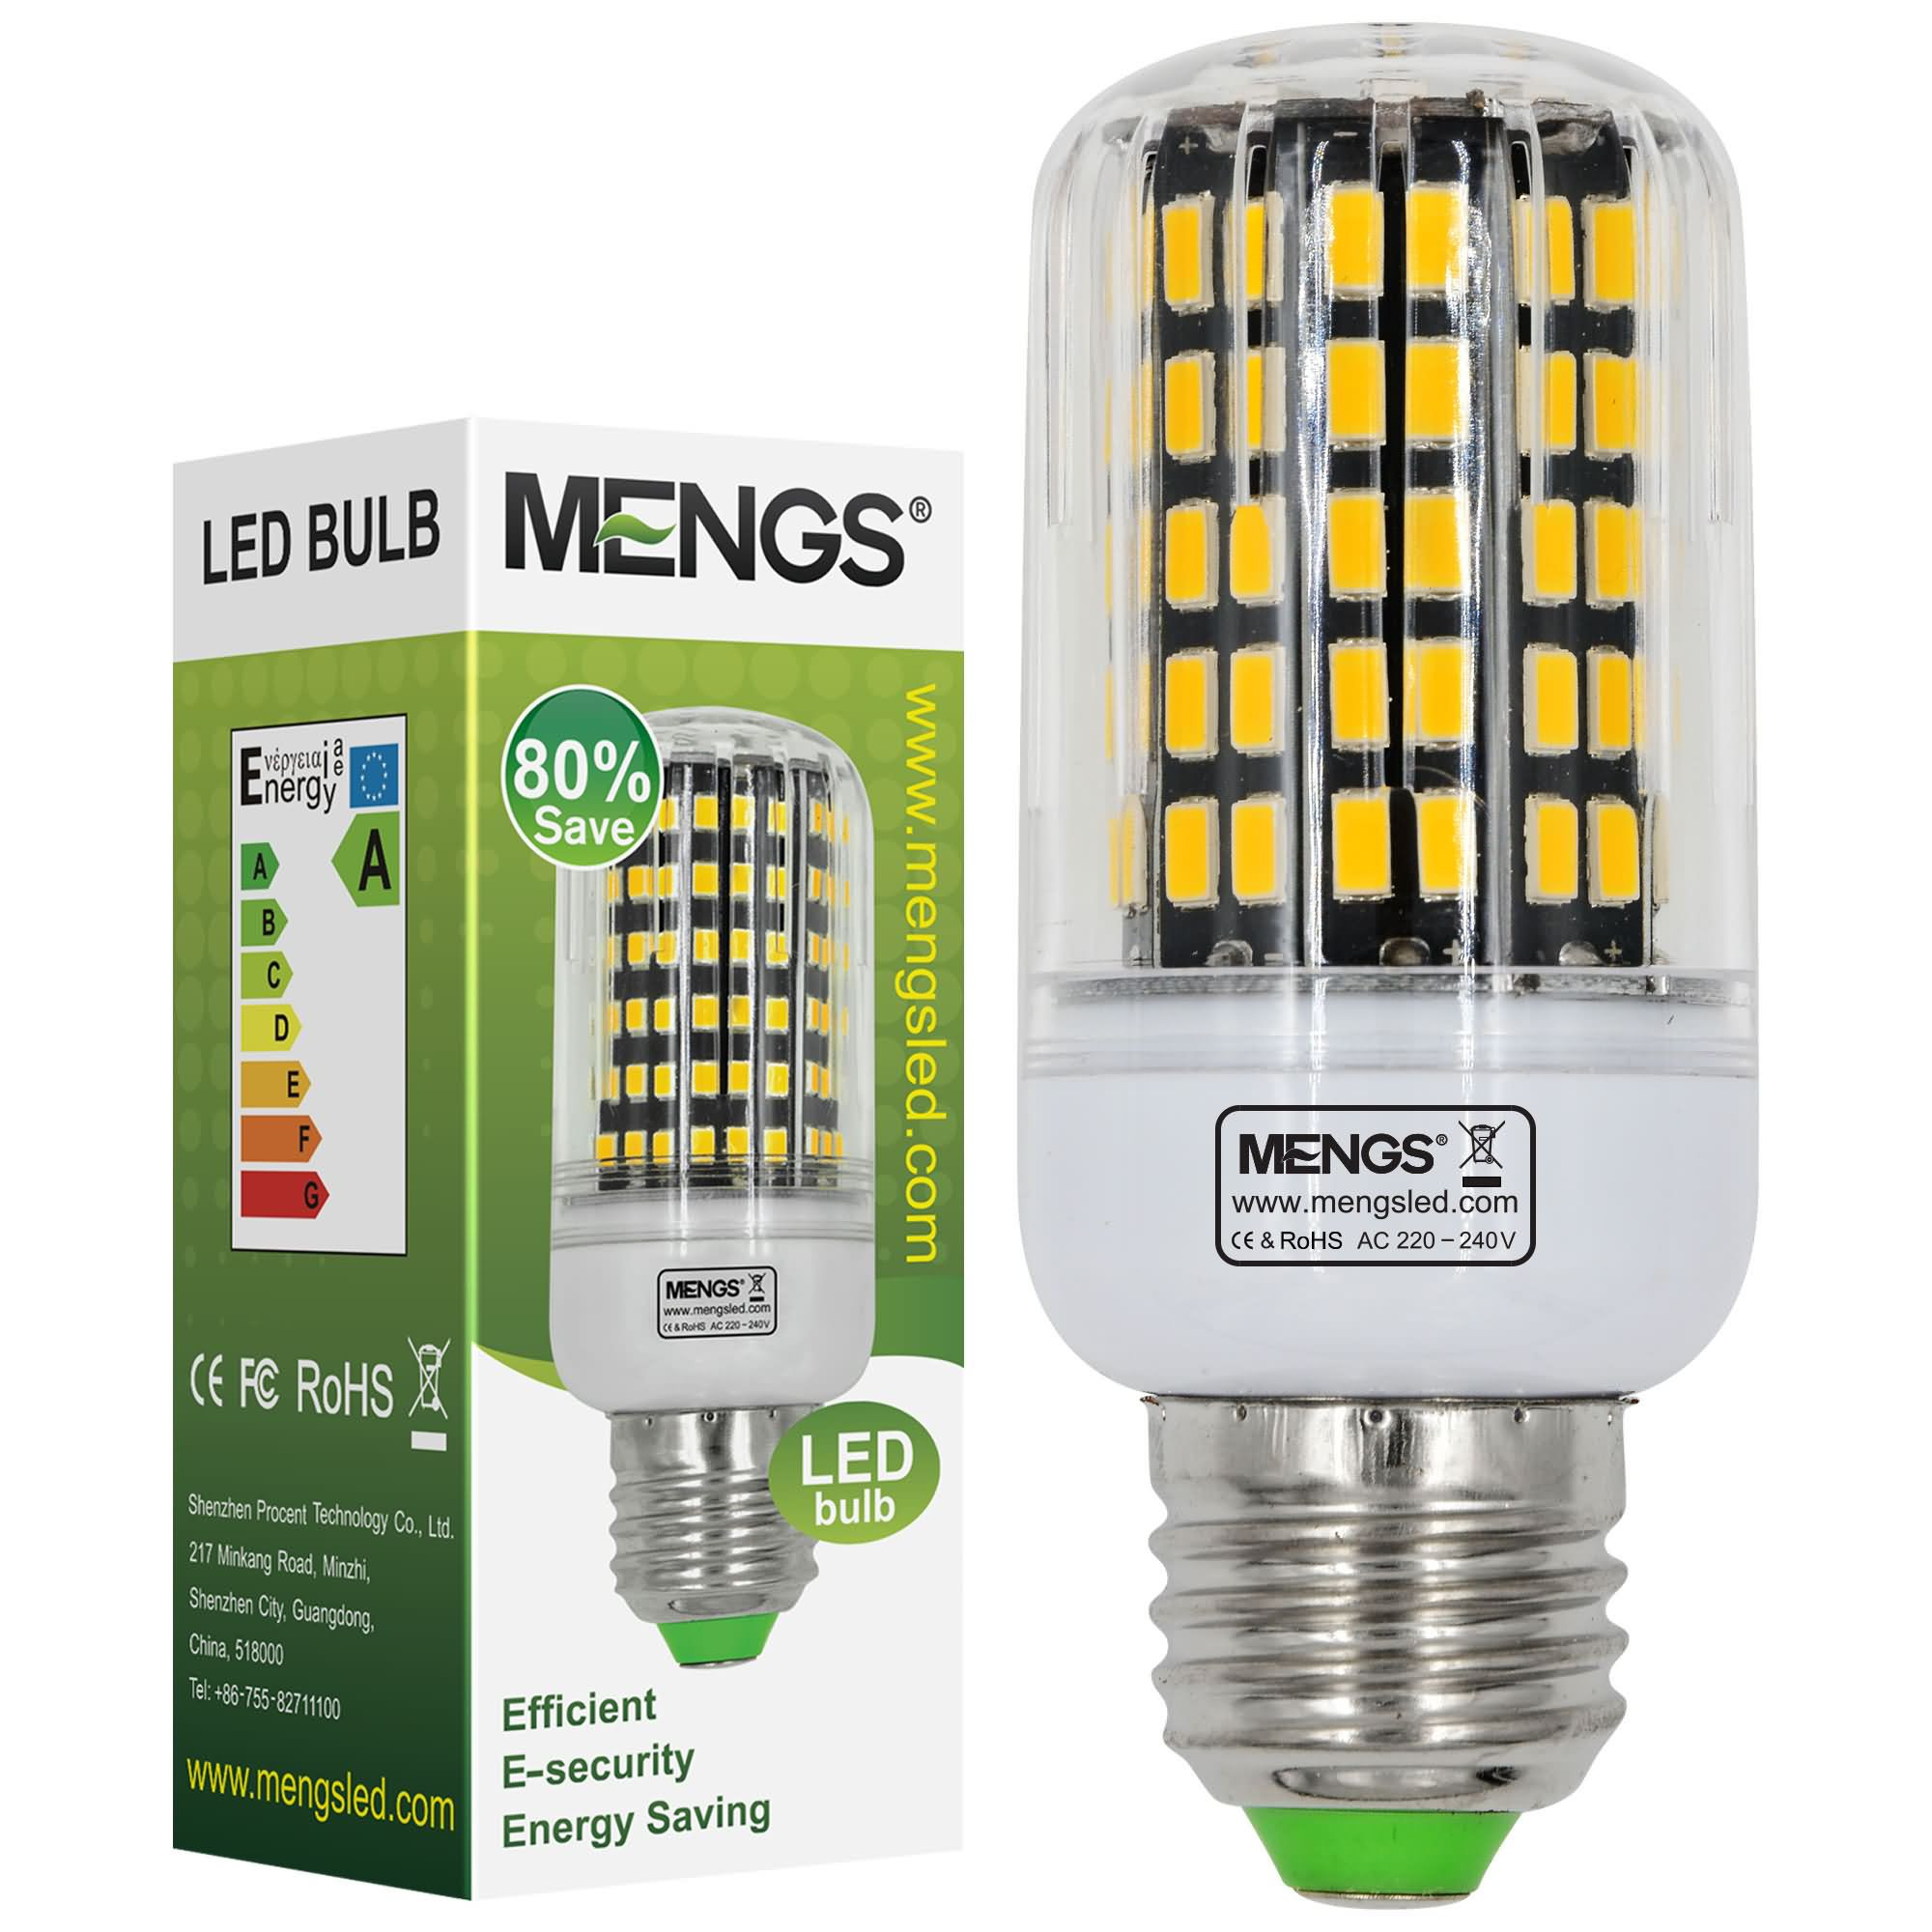 MENGS® E27 15W LED Corn Light 108x 5733 SMD LED Bulb Lamp In Warm White Energy-Saving Light